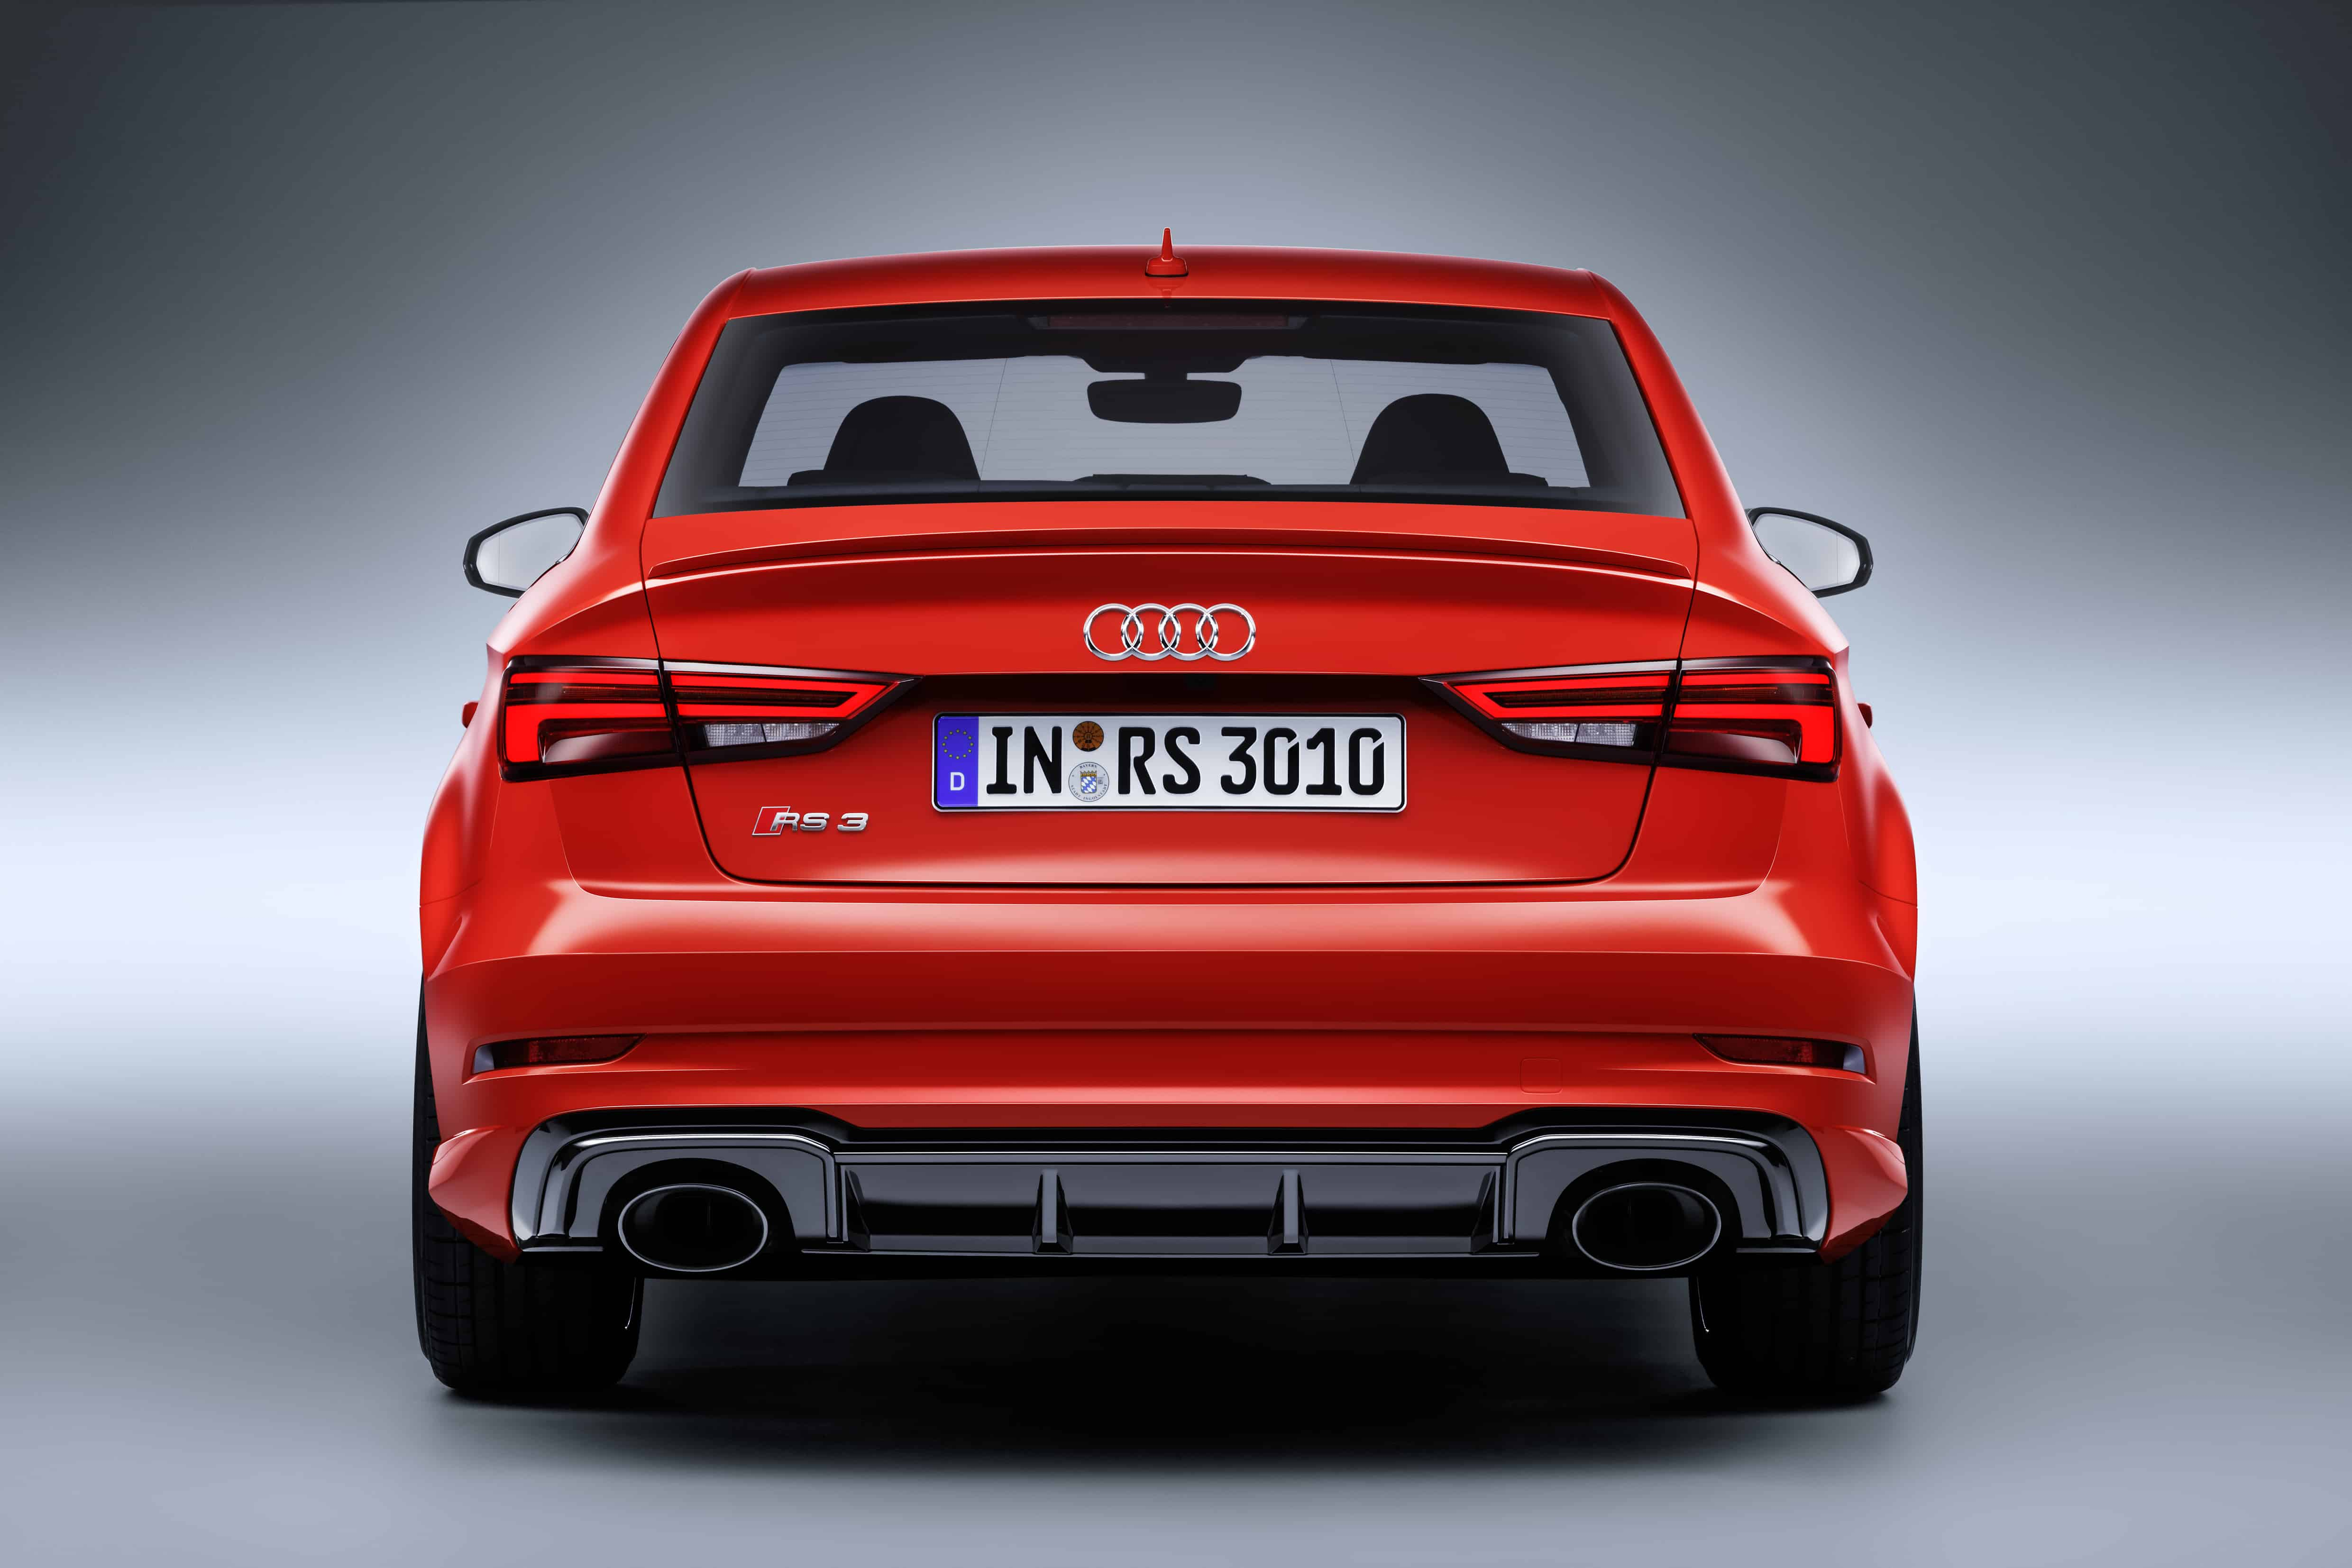 © Audi-mediacenter.com